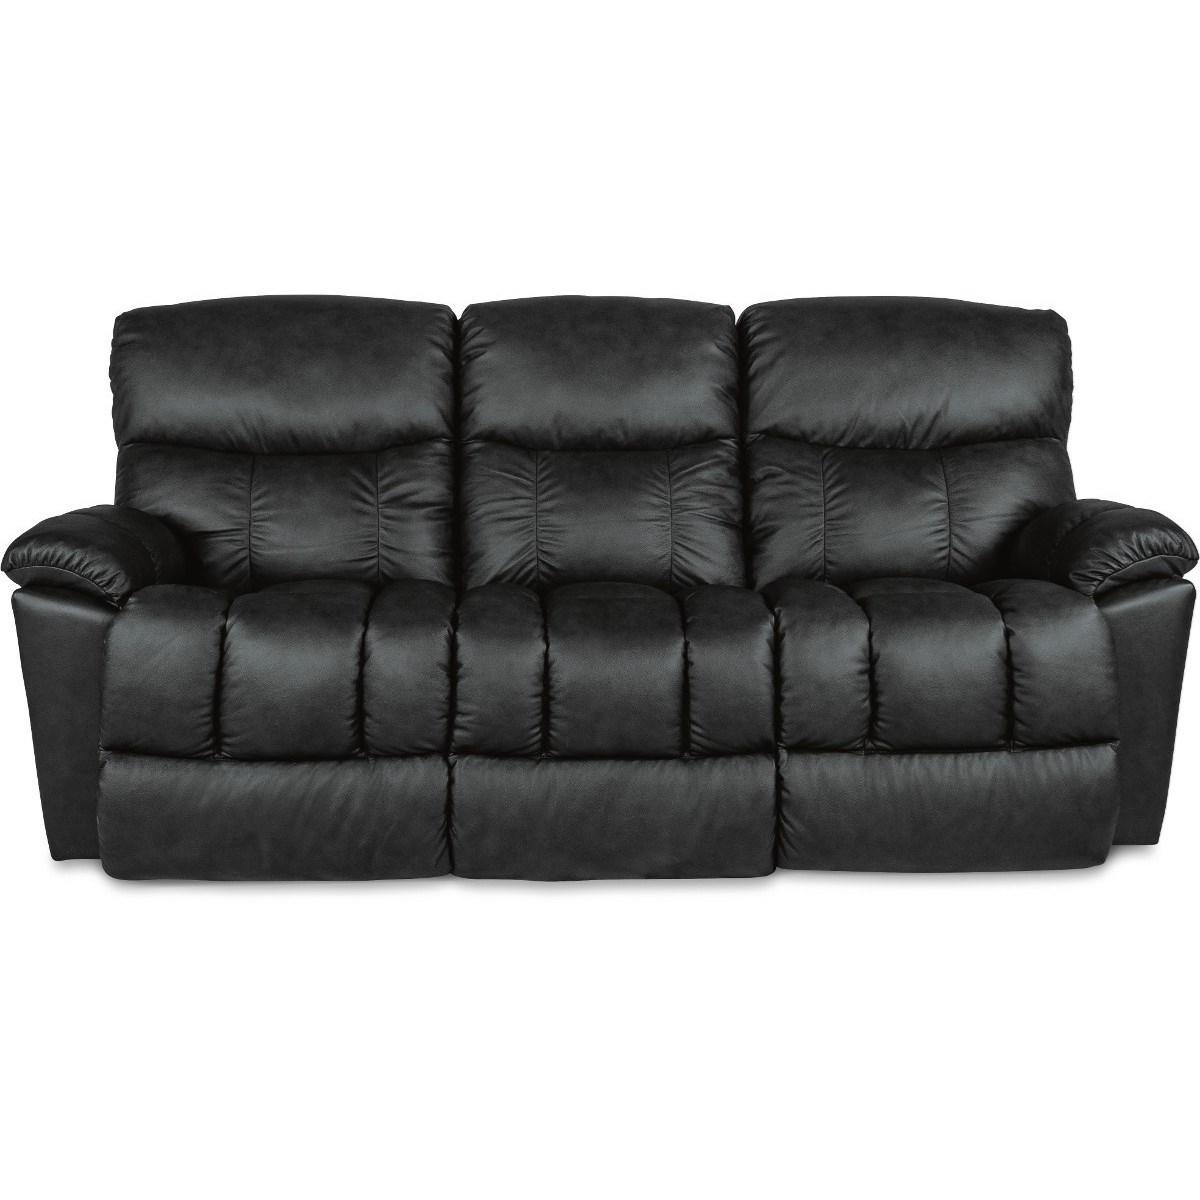 Morrison Reclining Sofa by La-Z-Boy at Bullard Furniture